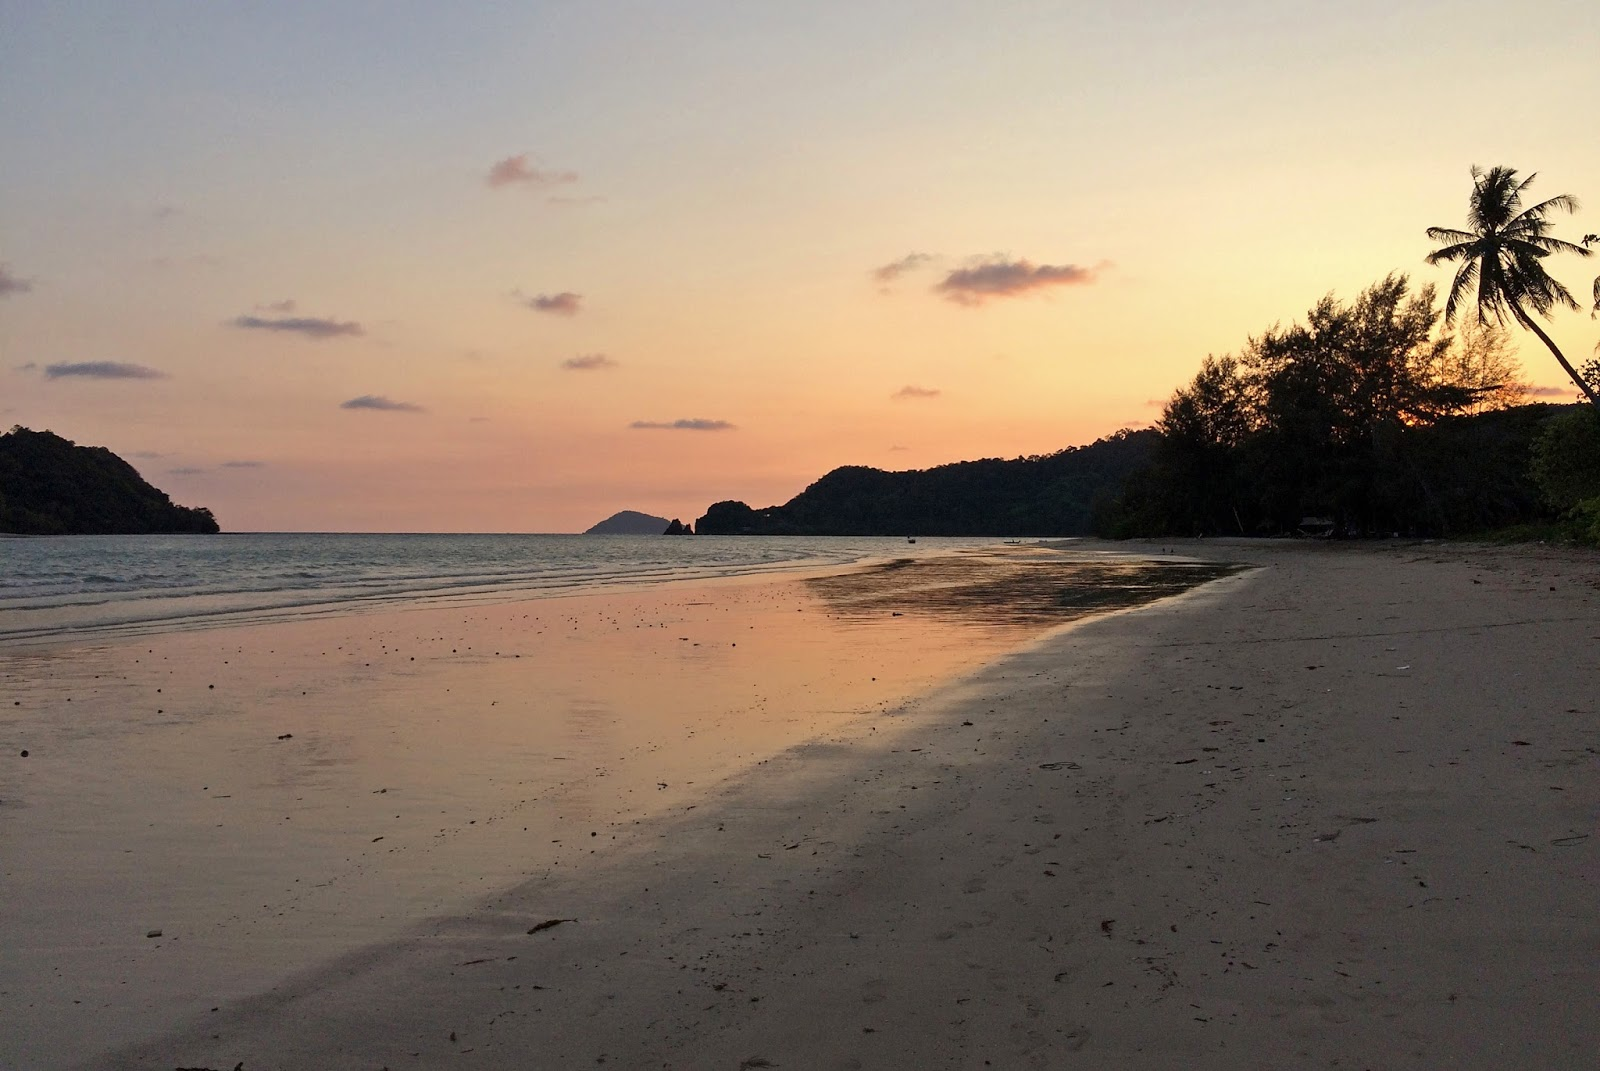 Gdzie na wakacje do Azji - Tajlandia - Koh Mak